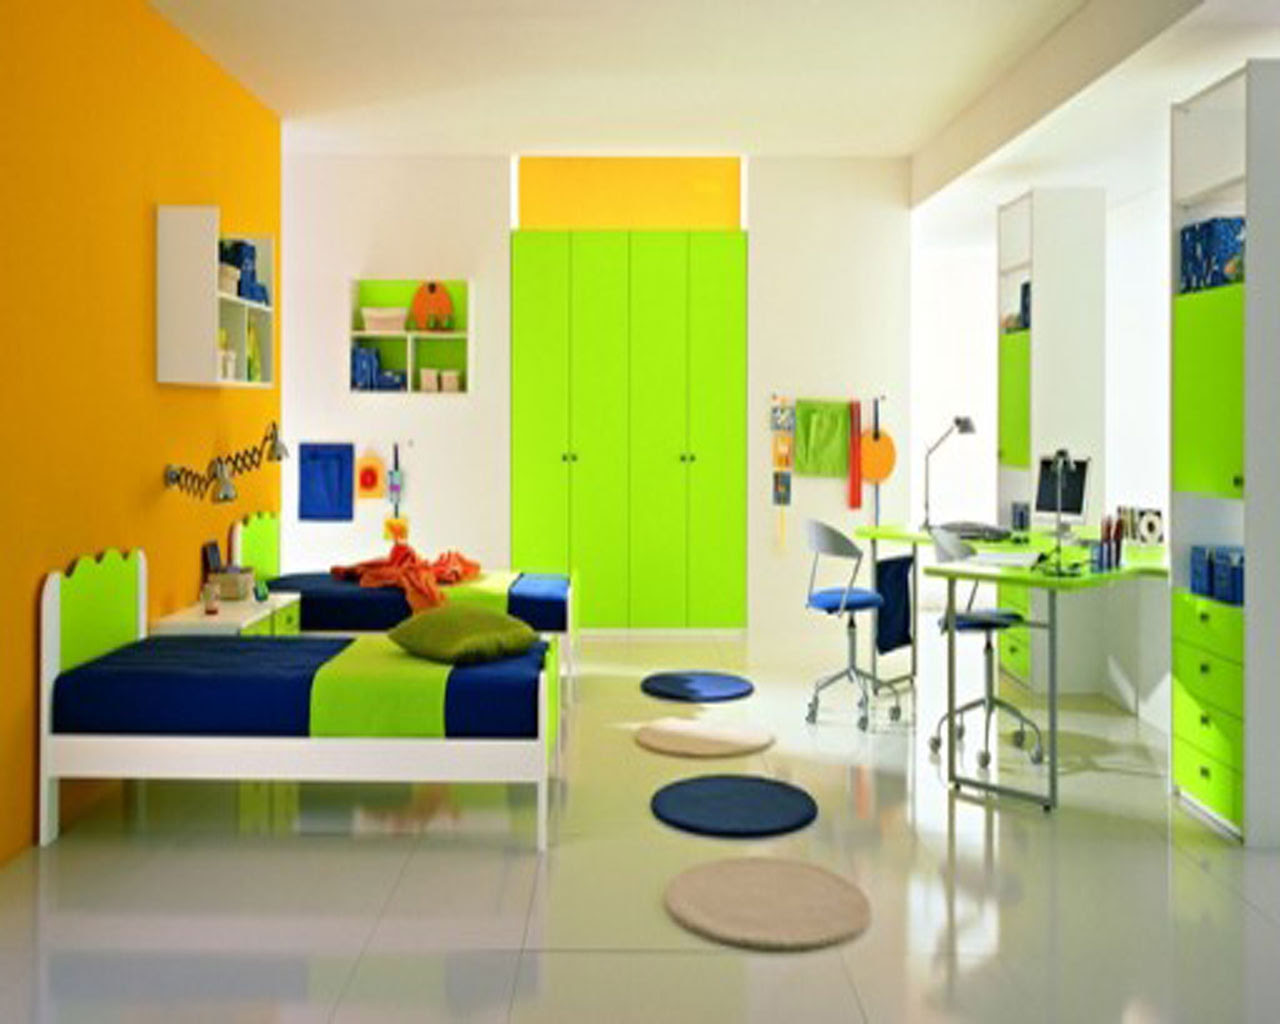 Tips To Designing Your Children S Room Propertypro Insider